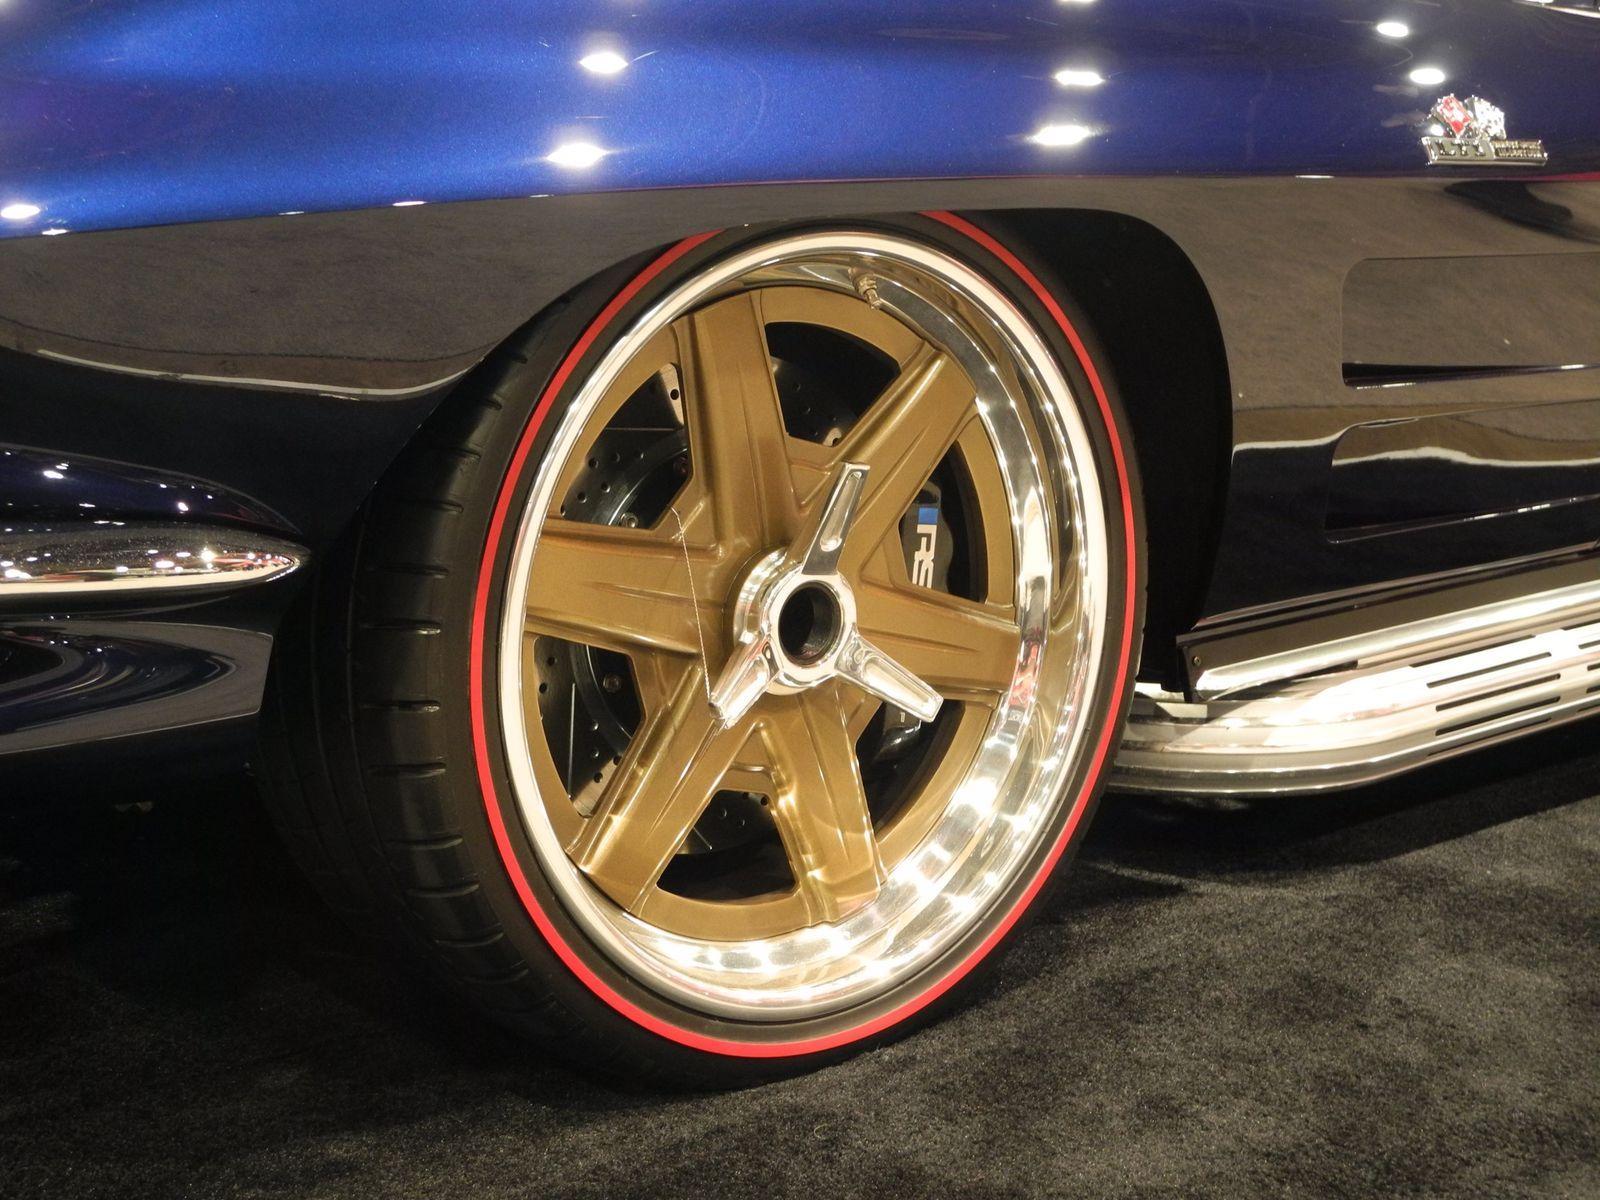 1964 Chevrolet Corvette Stingray | TBT: Roadster Shop Wins GM Design Award for